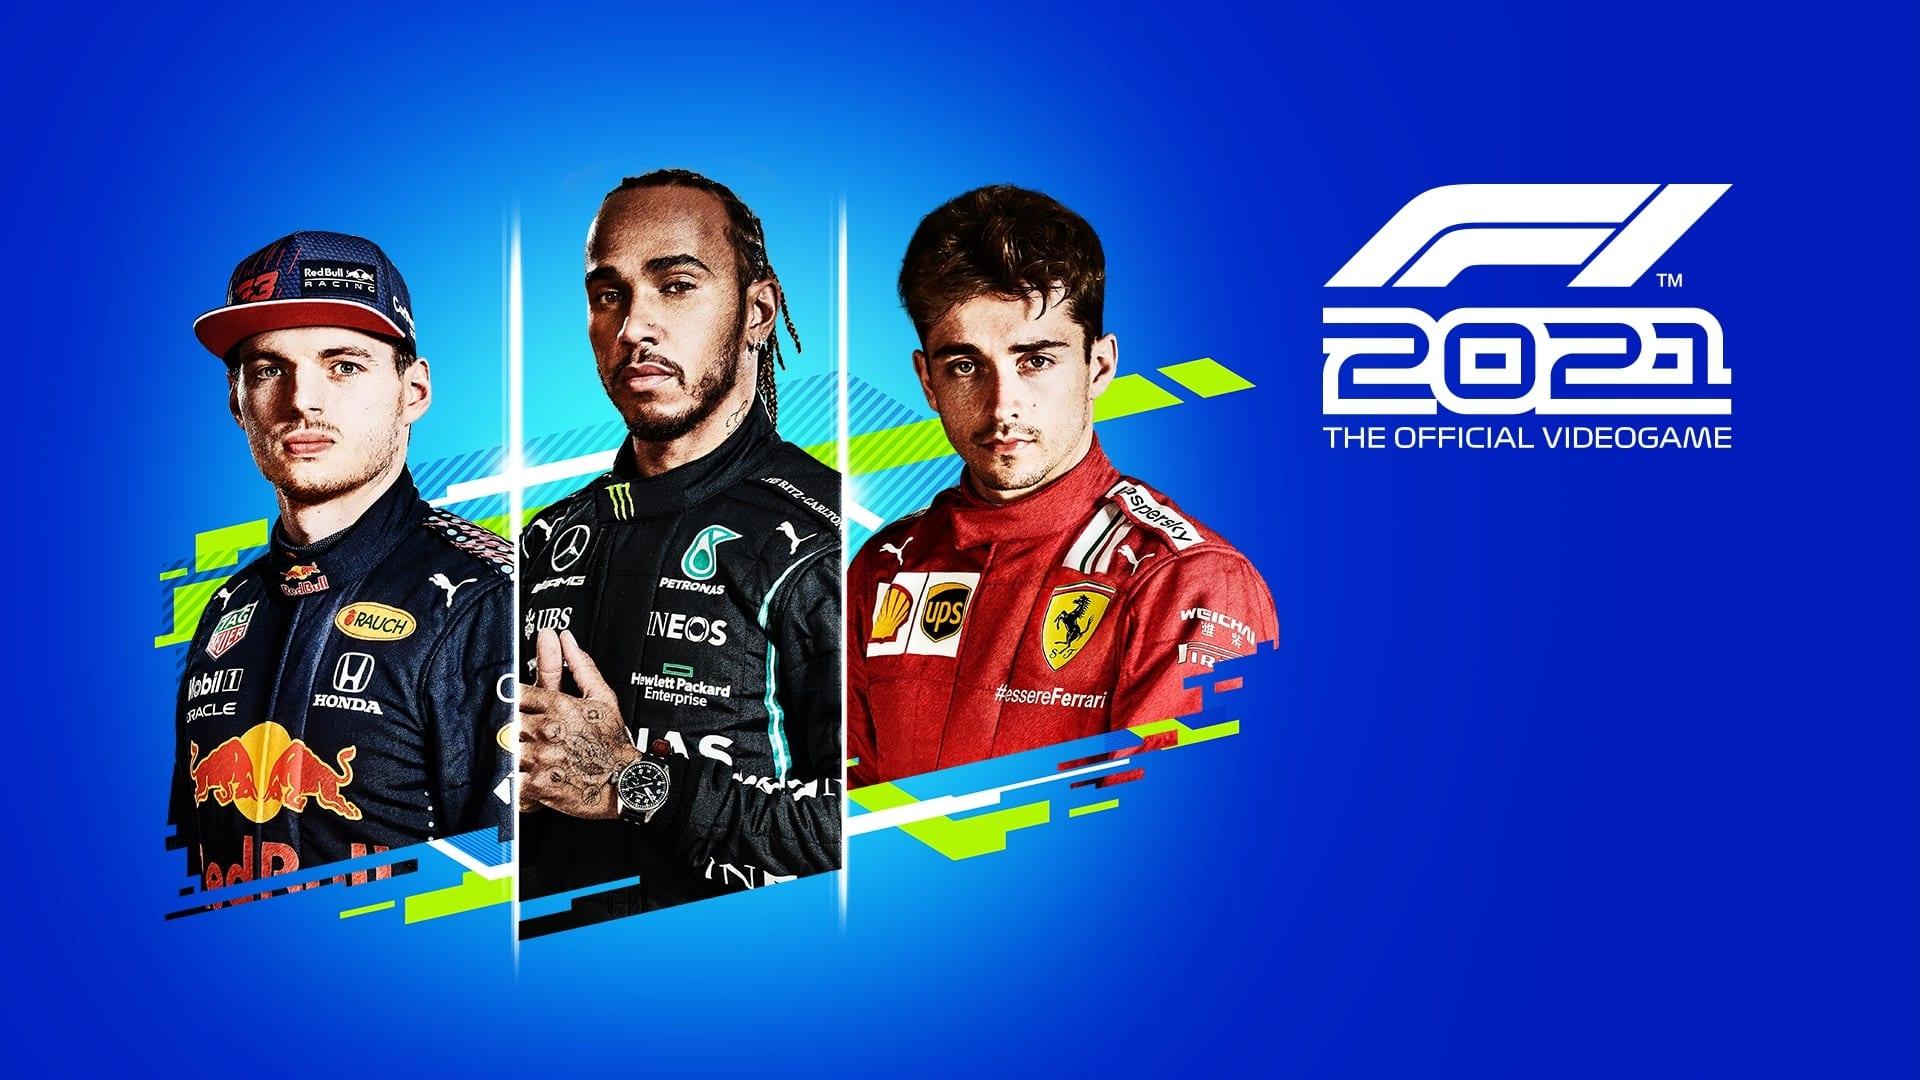 Coperta F1 2021